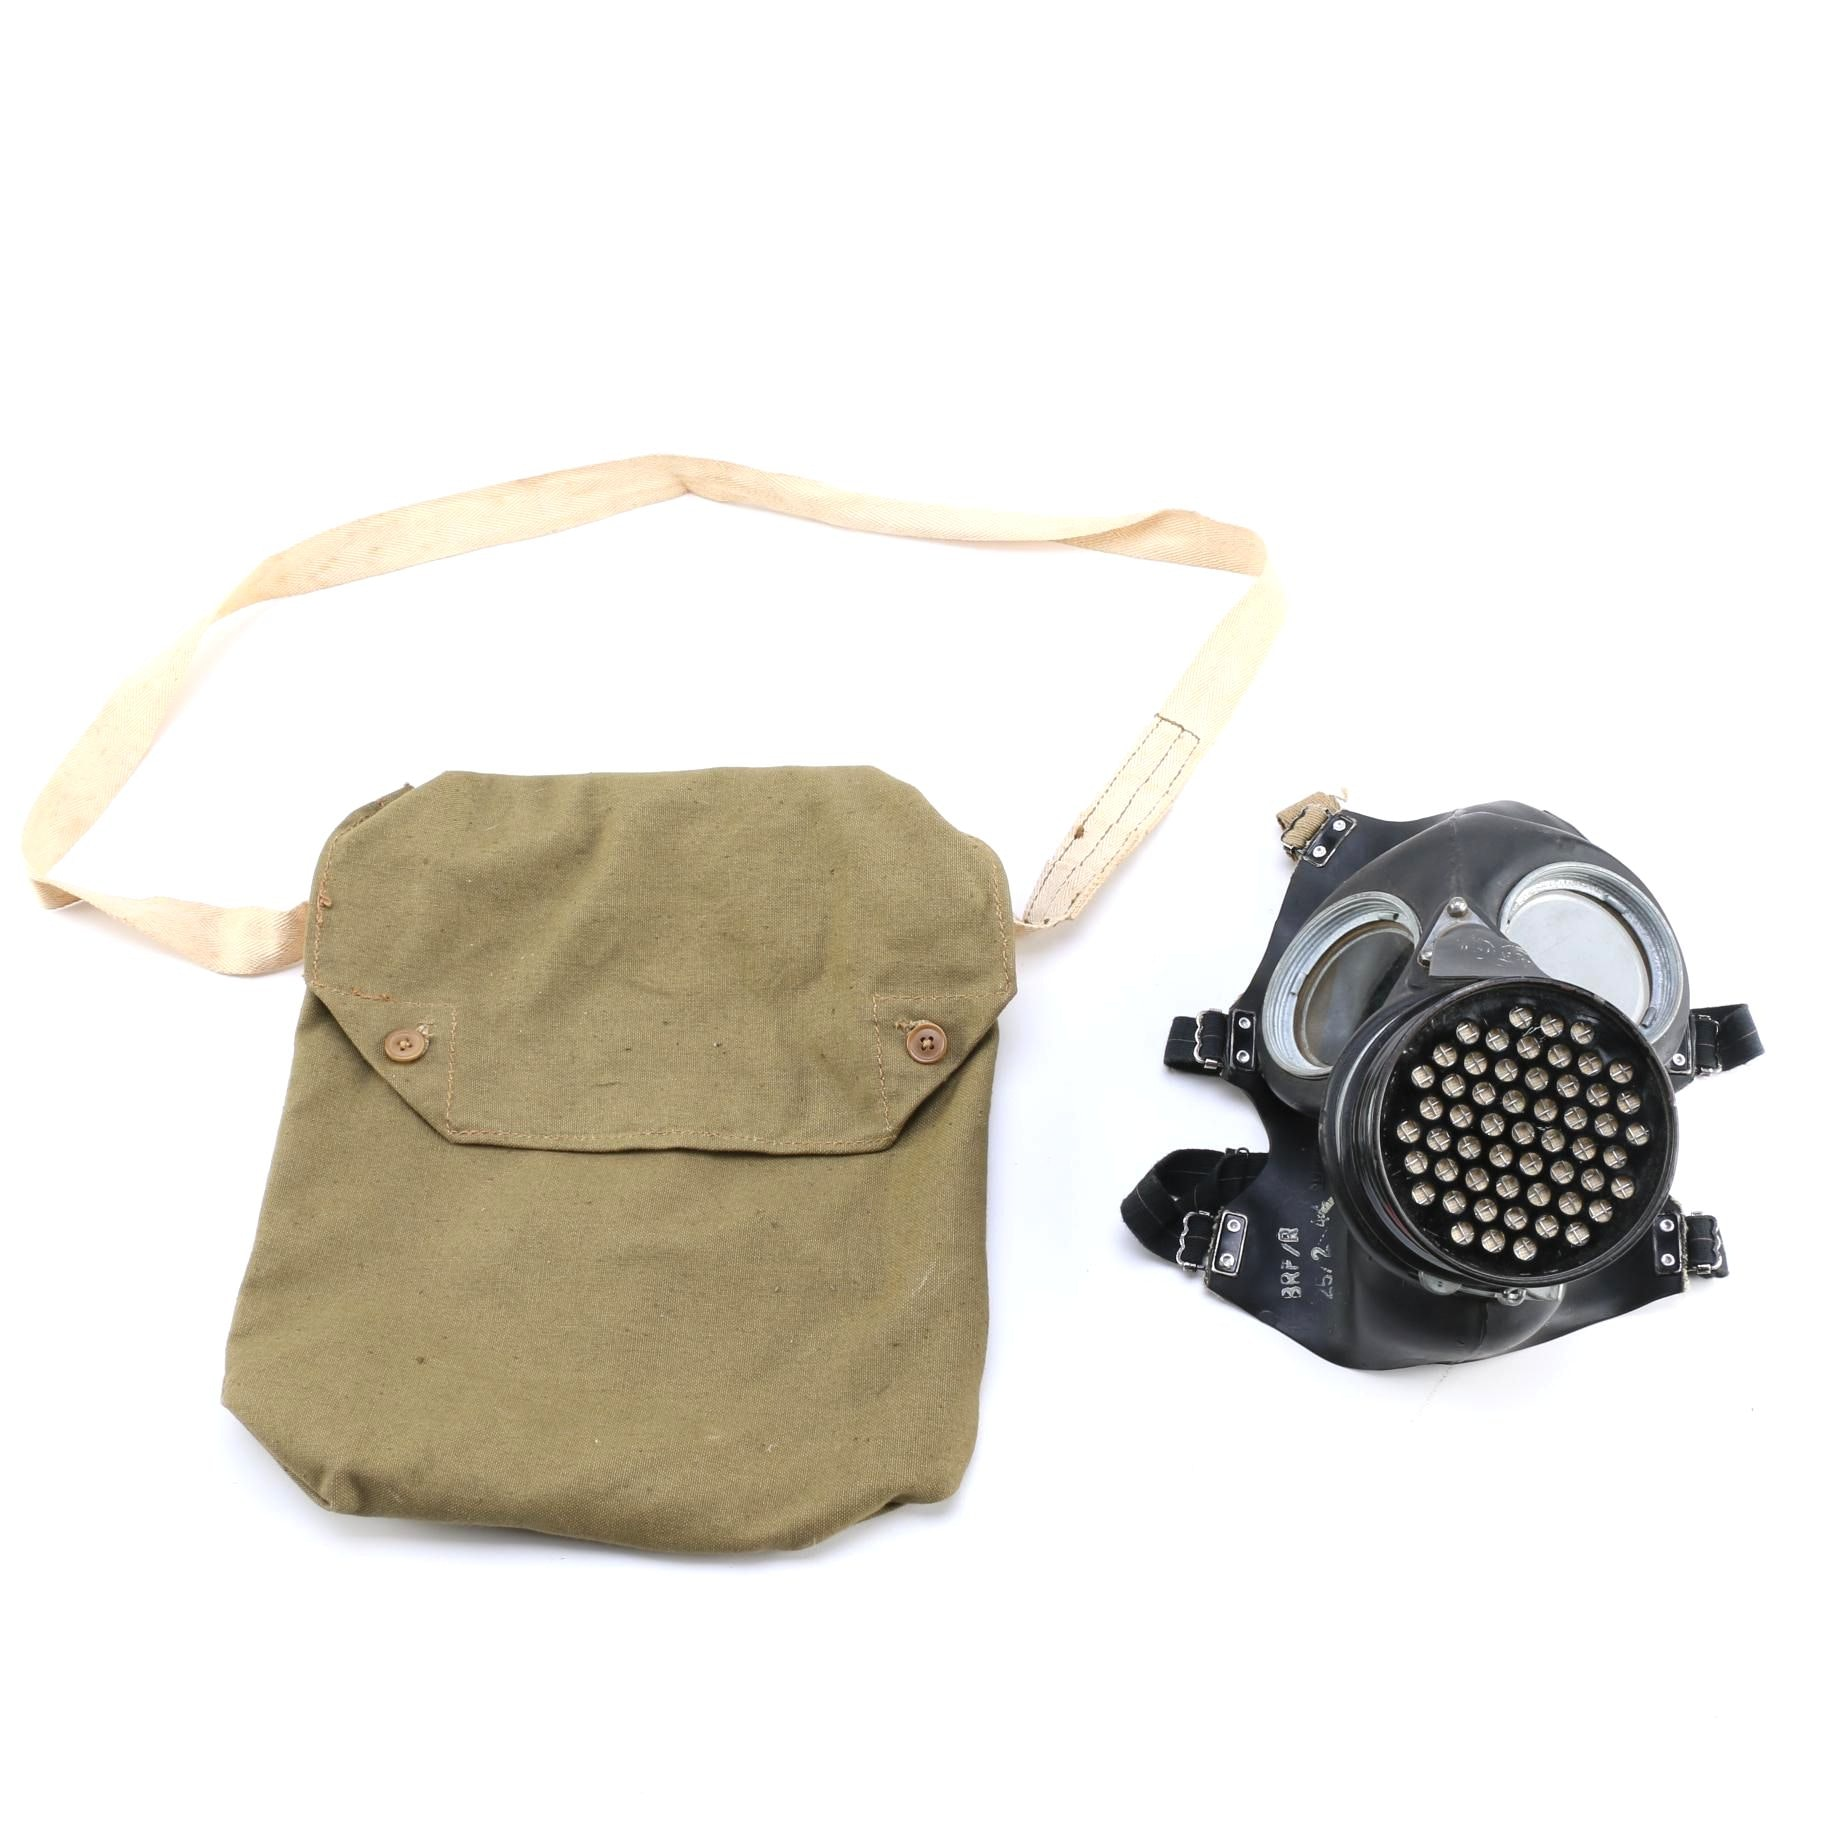 World War II Era Gas Mask with Bag